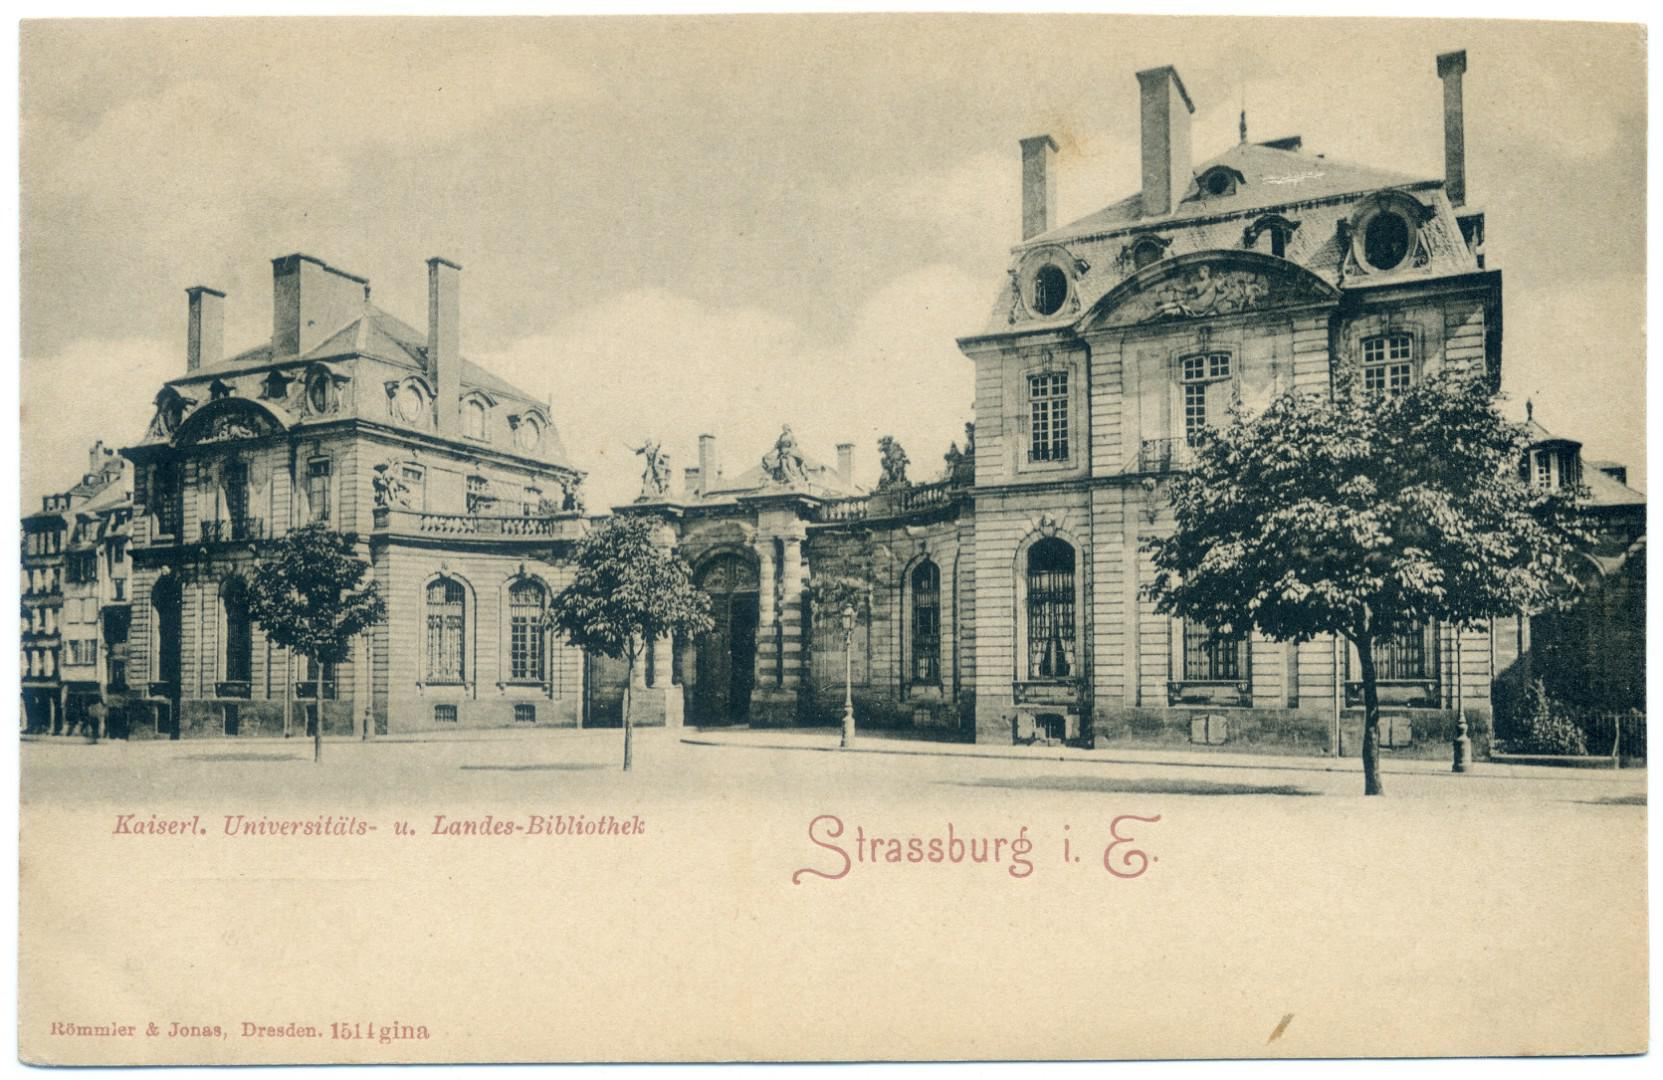 Strassburg (Strasbourg) - Landesbibliothek - Palais Rohan